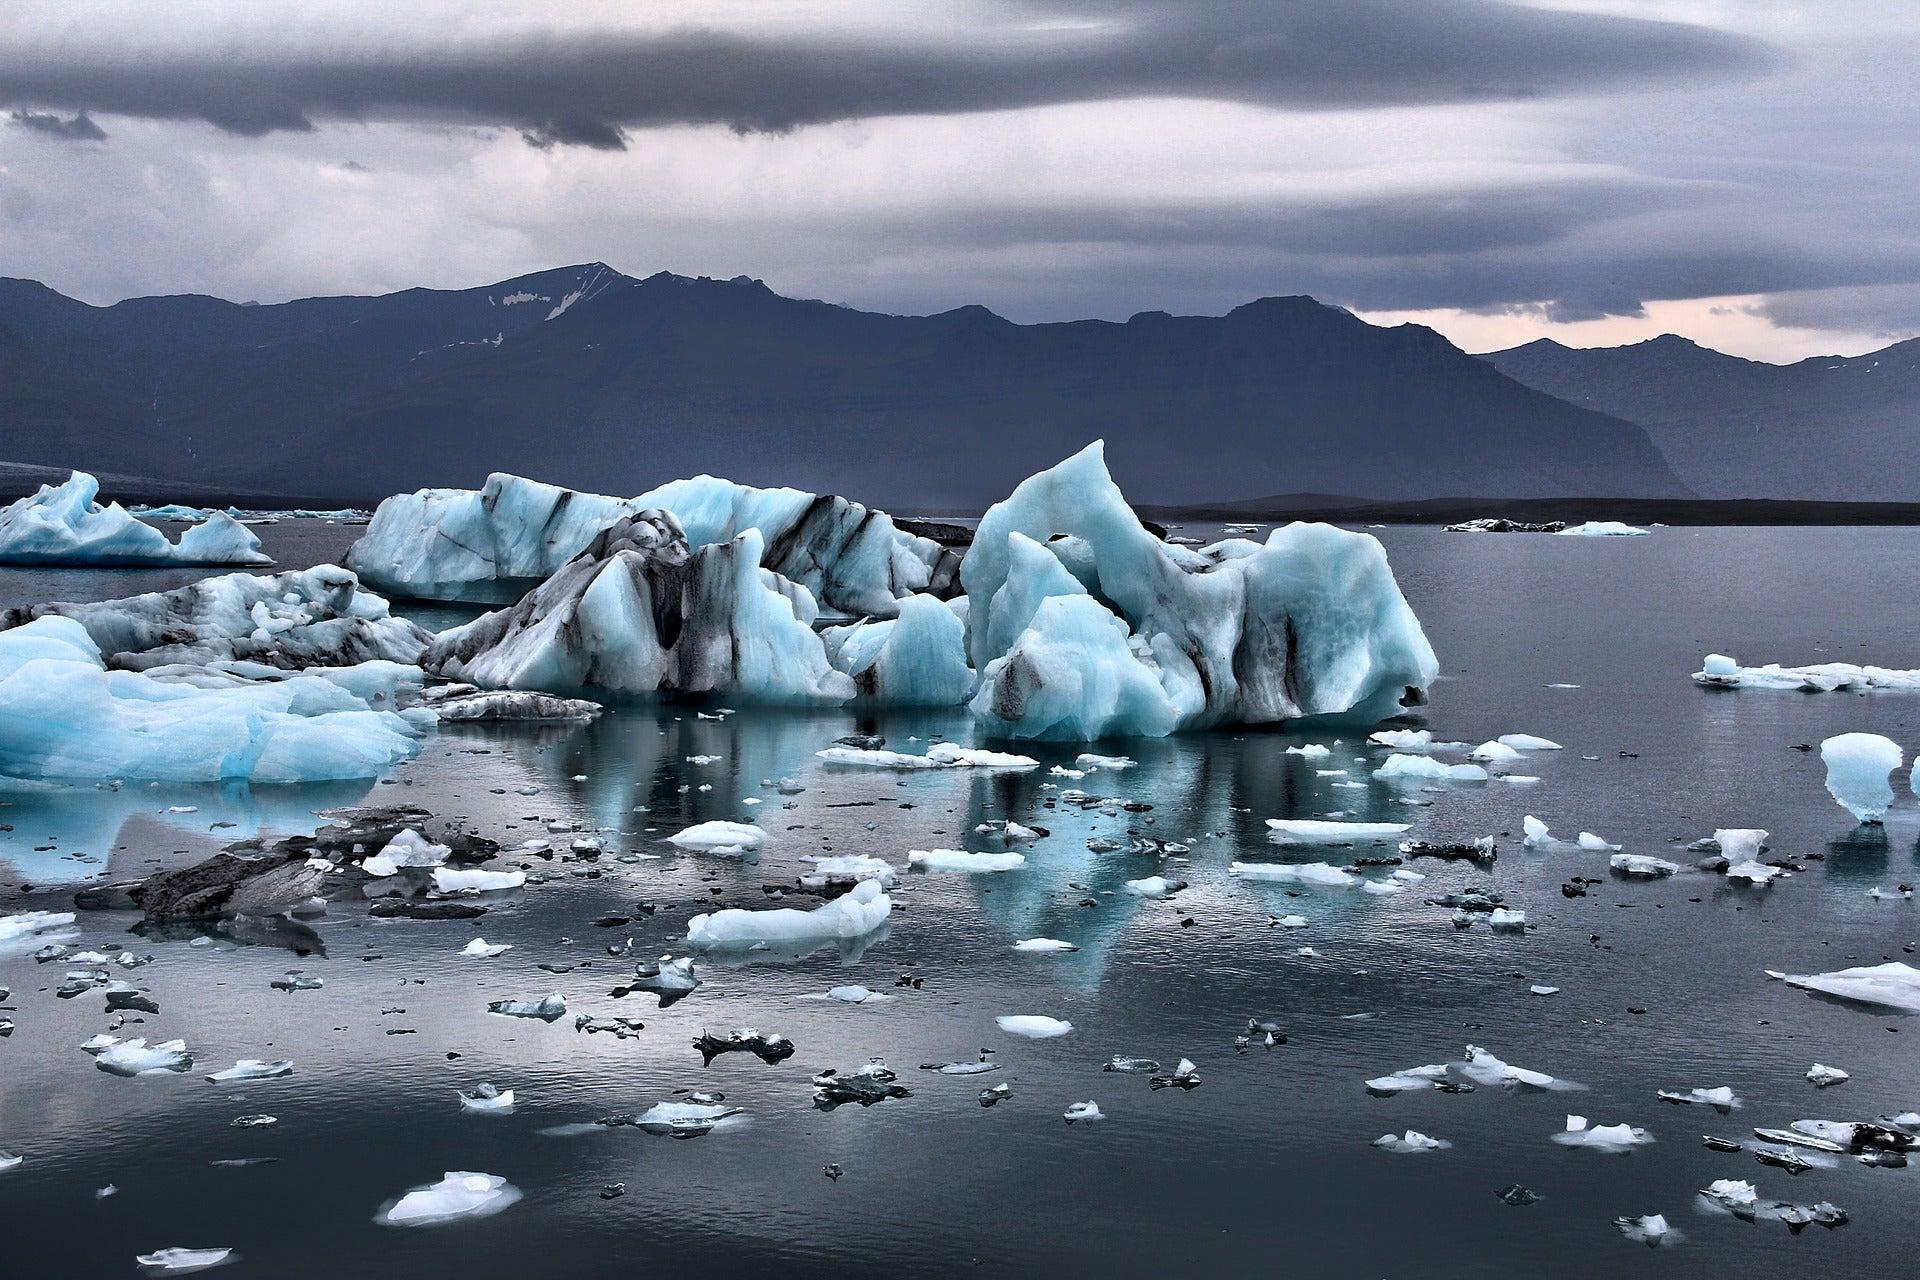 image of melting glaciers